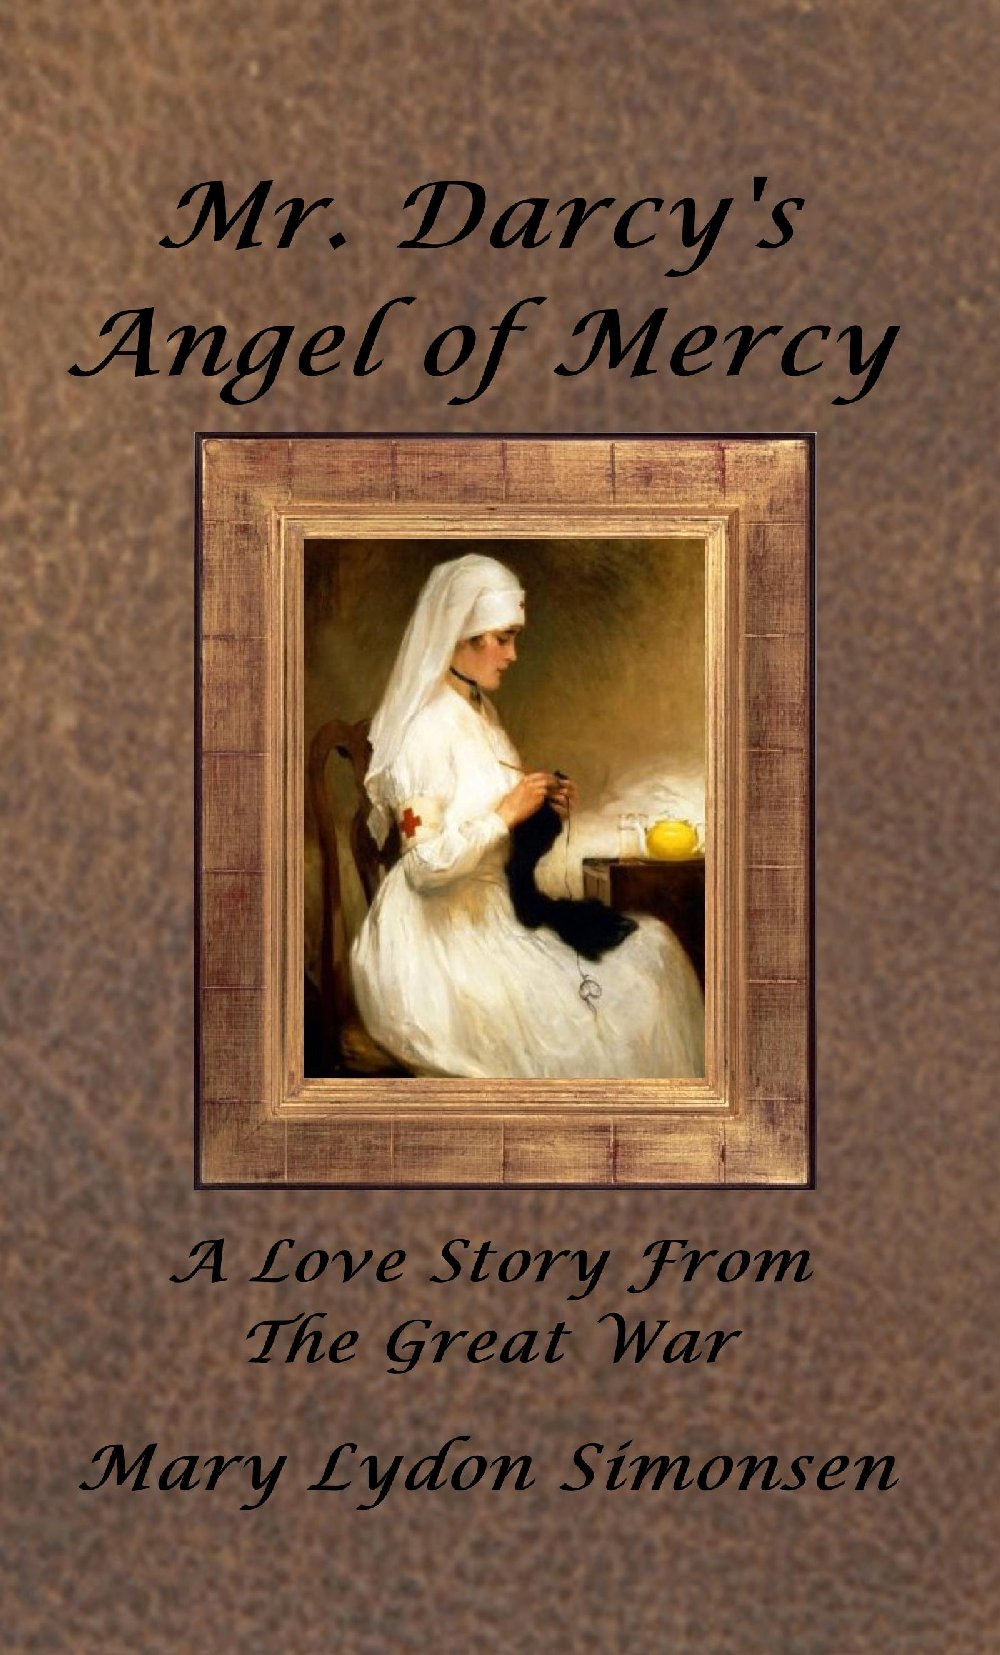 Mary Lydon Simonsen | Jane Austen Variations